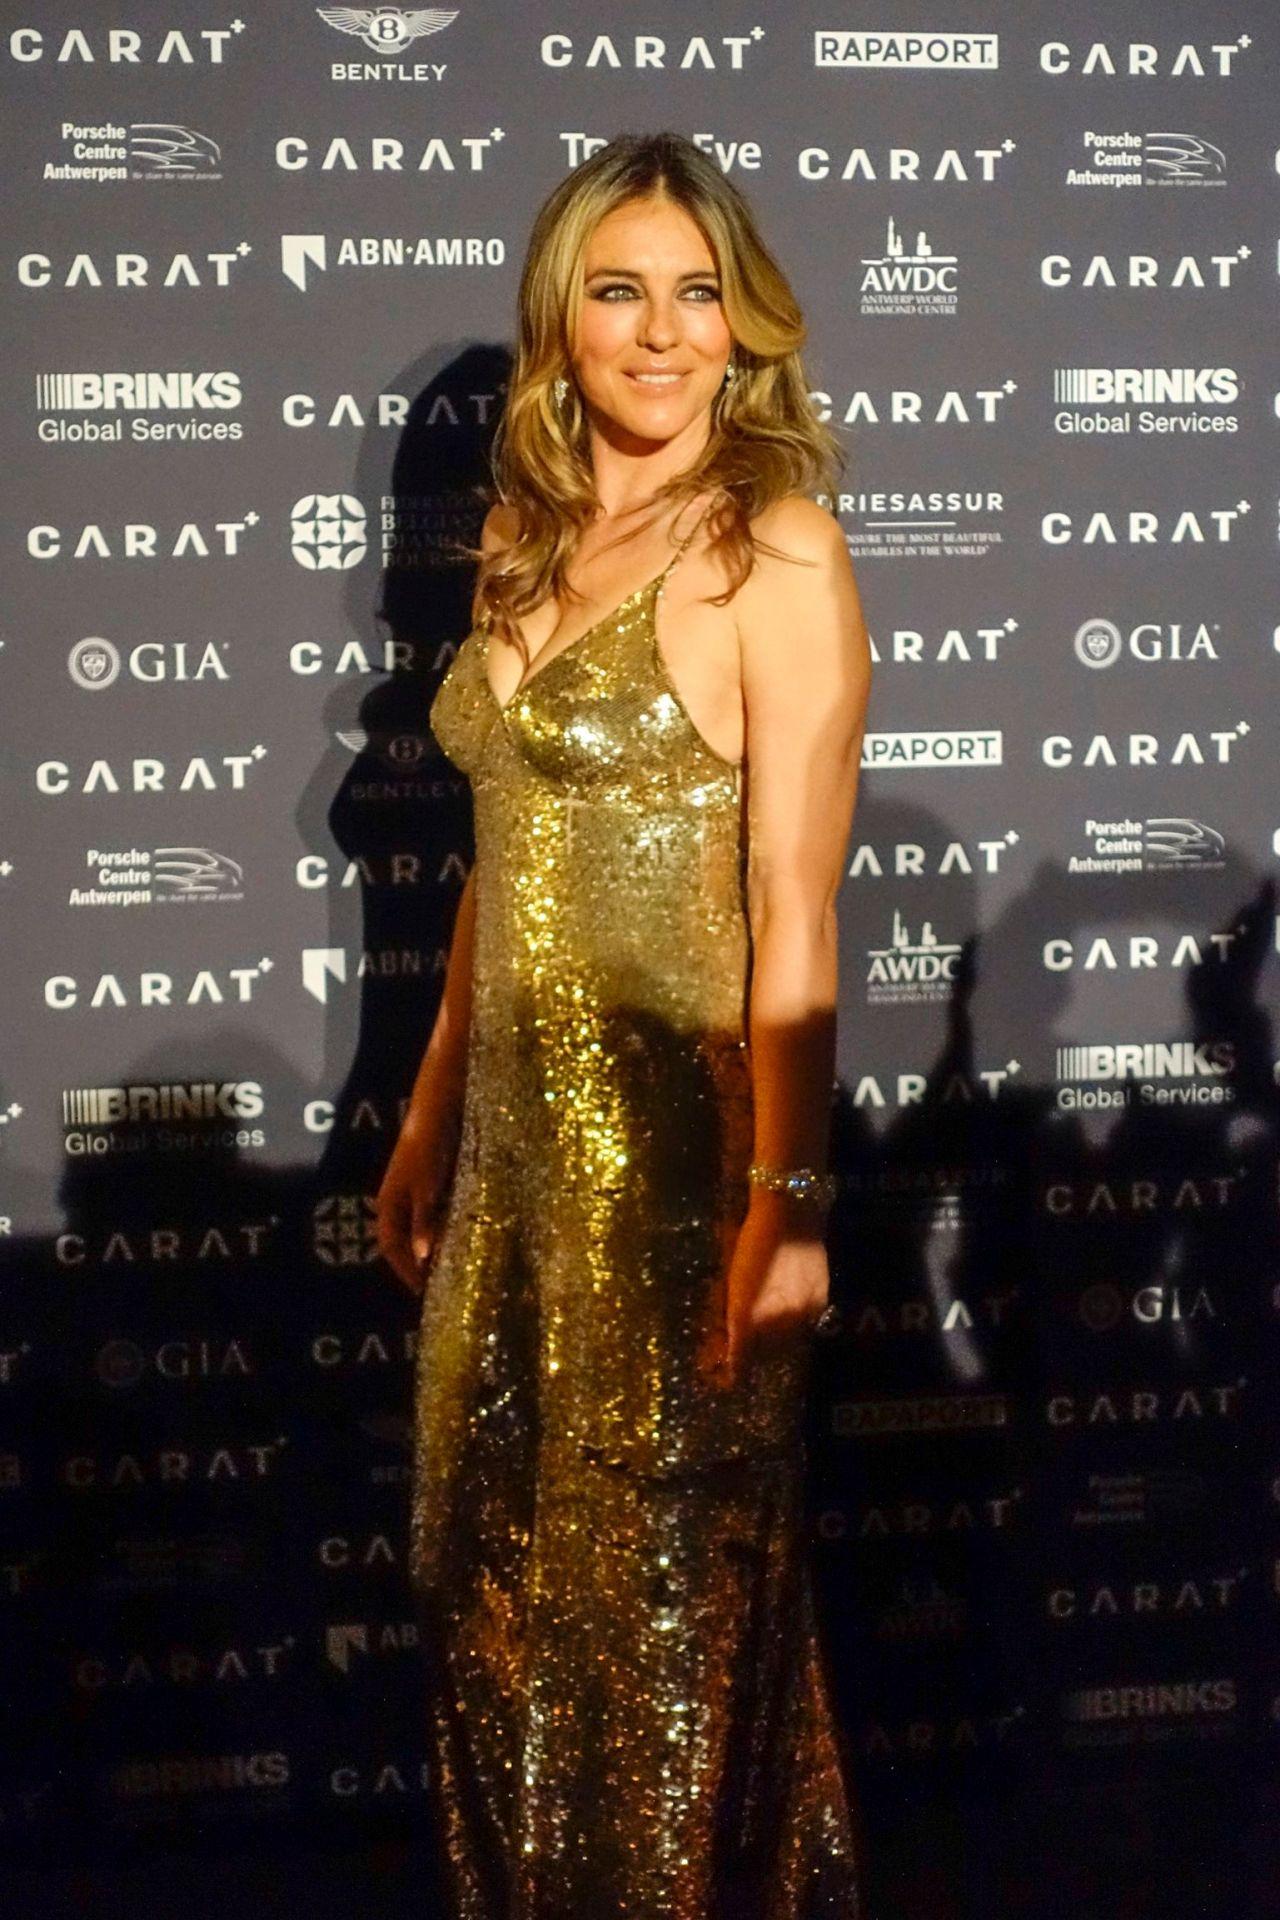 http://celebmafia.com/wp-content/uploads/2018/05/elizabeth-hurley-carat-exhibition-opening-in-belgium-20.jpg